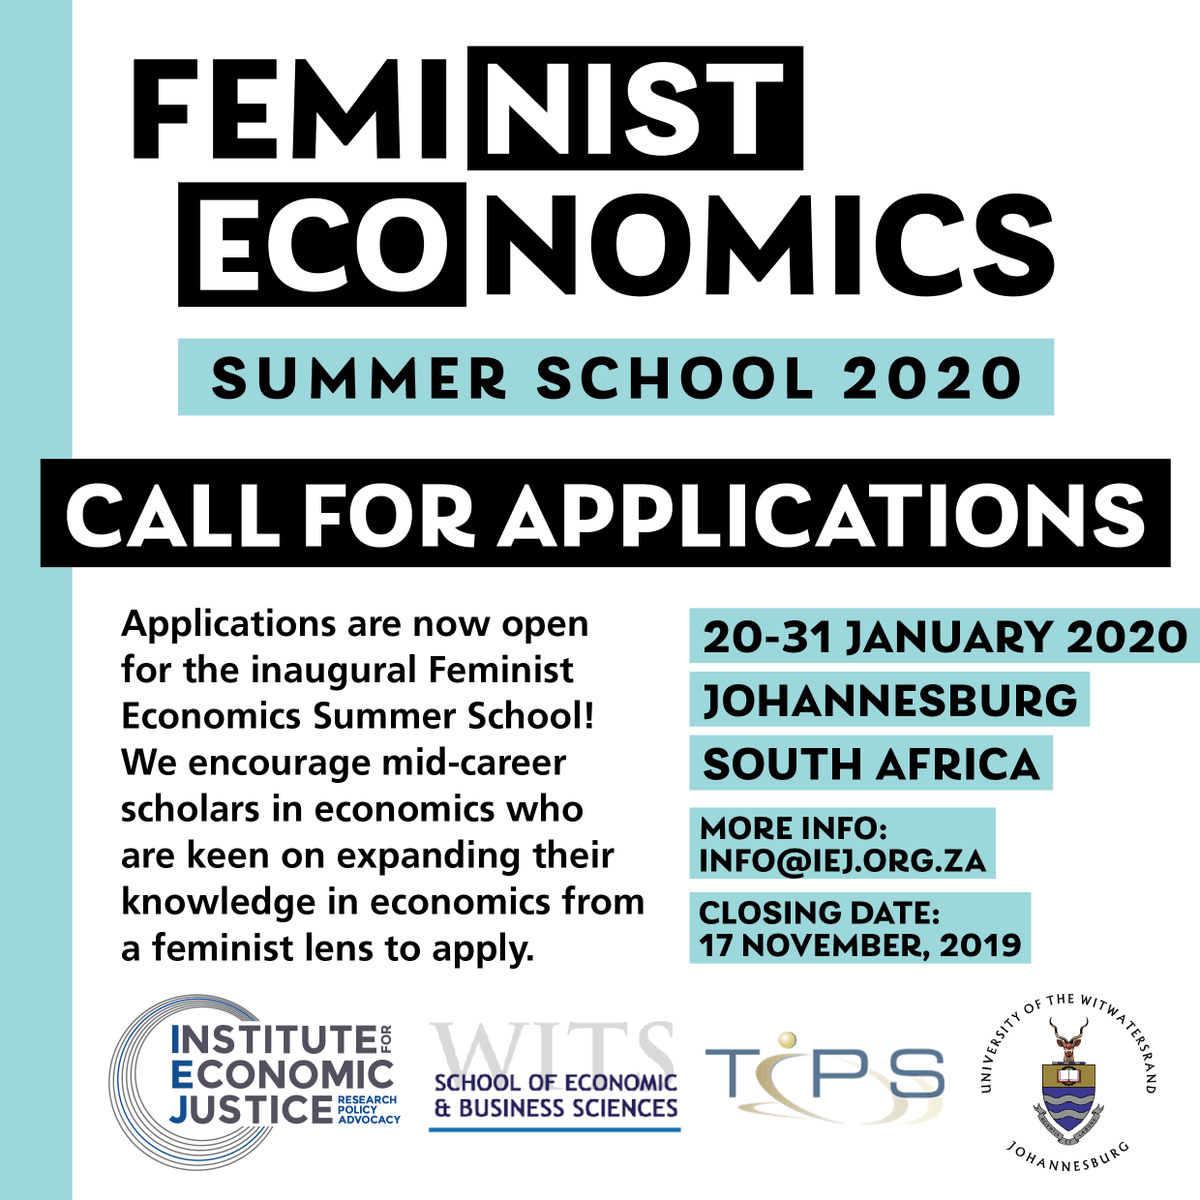 Summer School 2020.Feminist Economics Summer School 2020 At Wits University